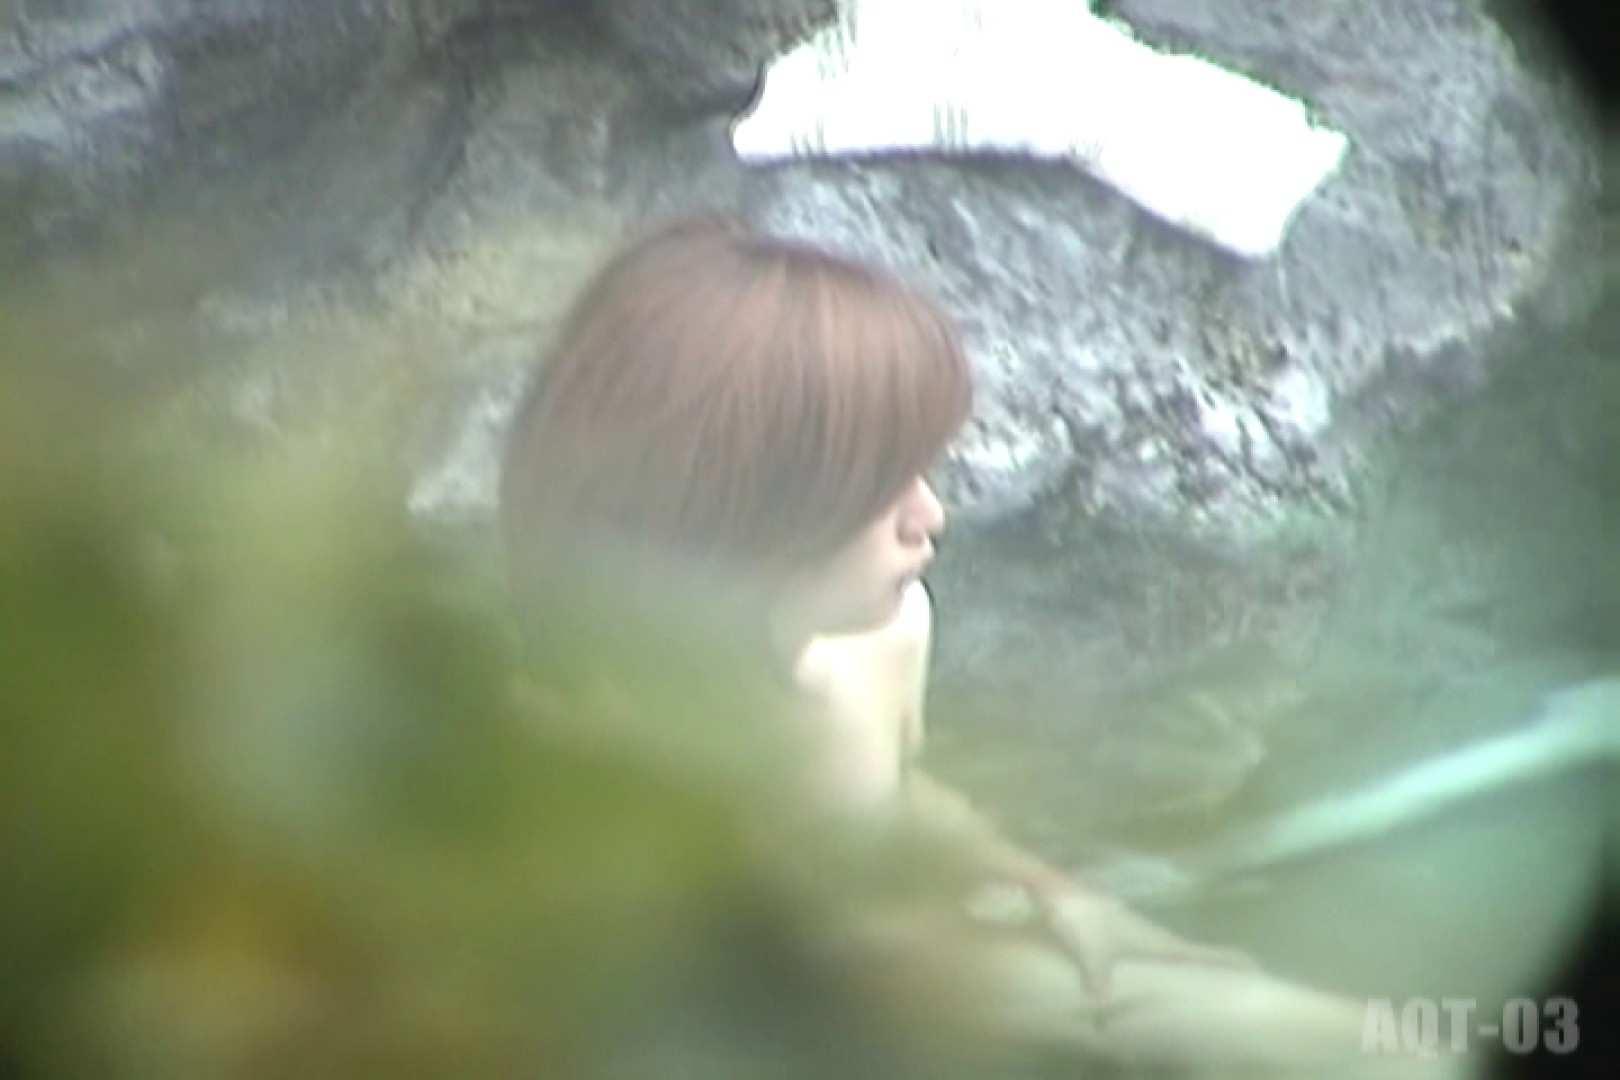 Aquaな露天風呂Vol.731 露天風呂突入 おめこ無修正動画無料 91pic 74